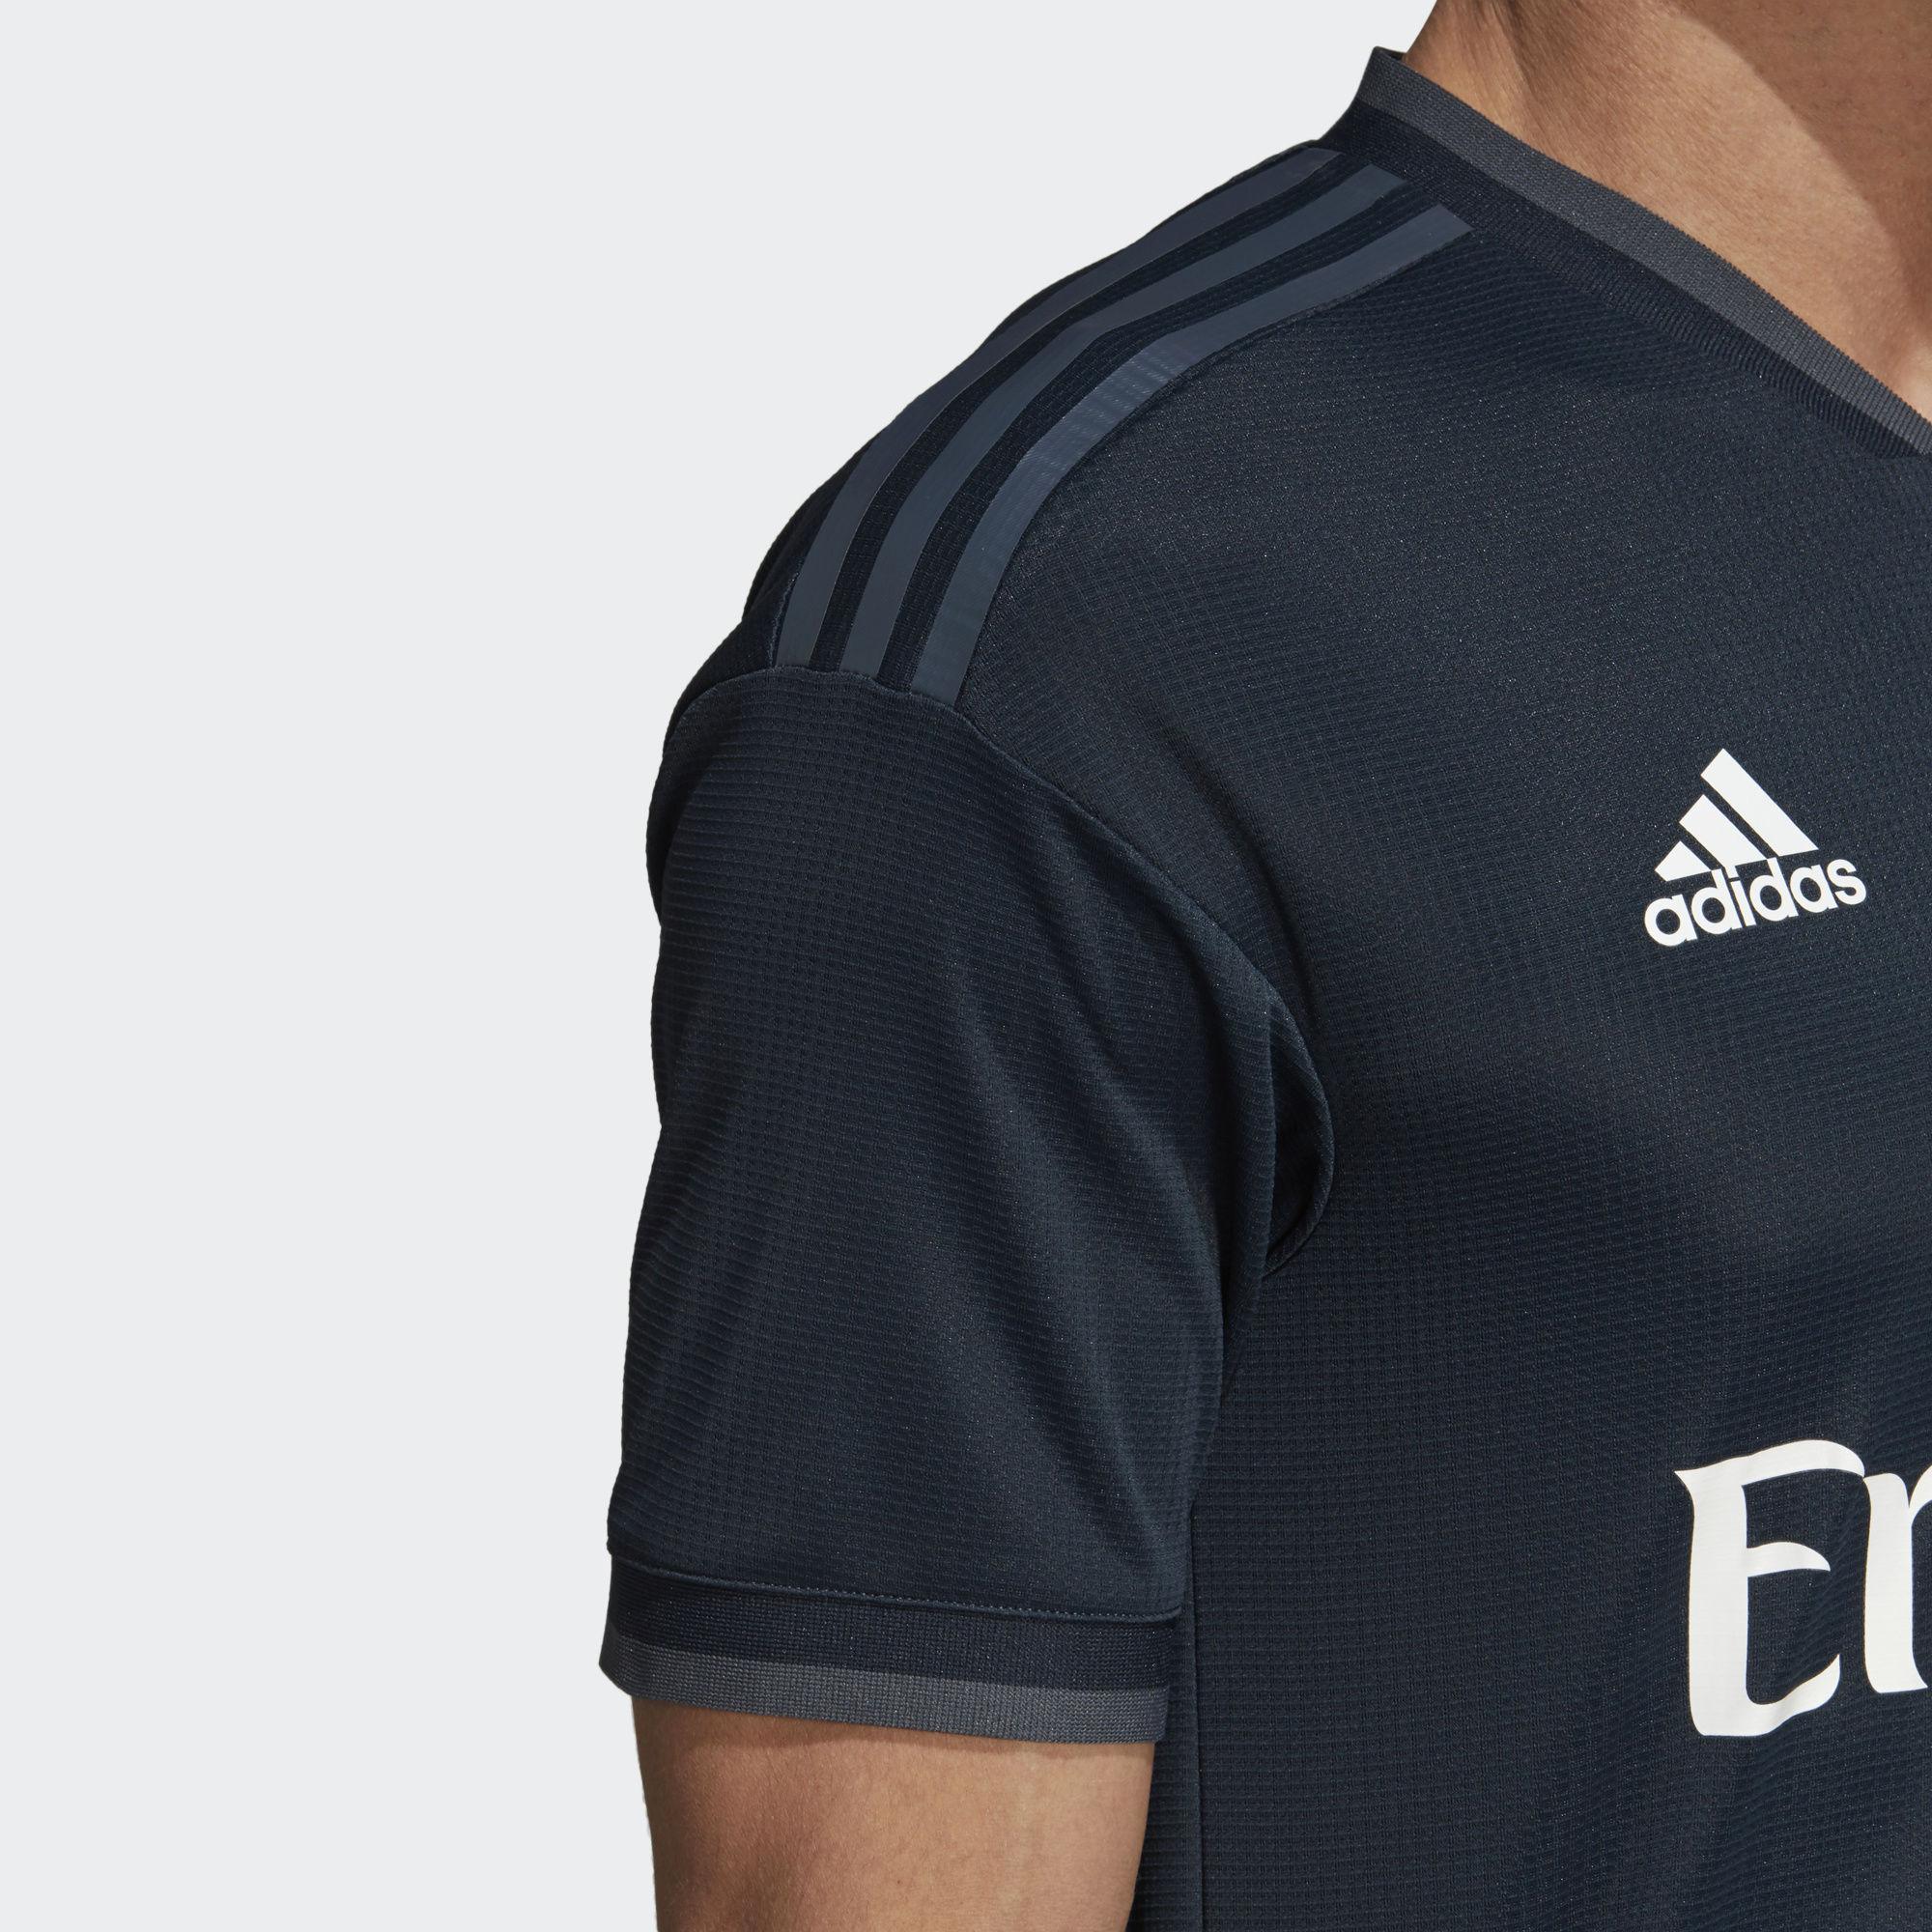 2018 19 Real Madrid Adidas Winter